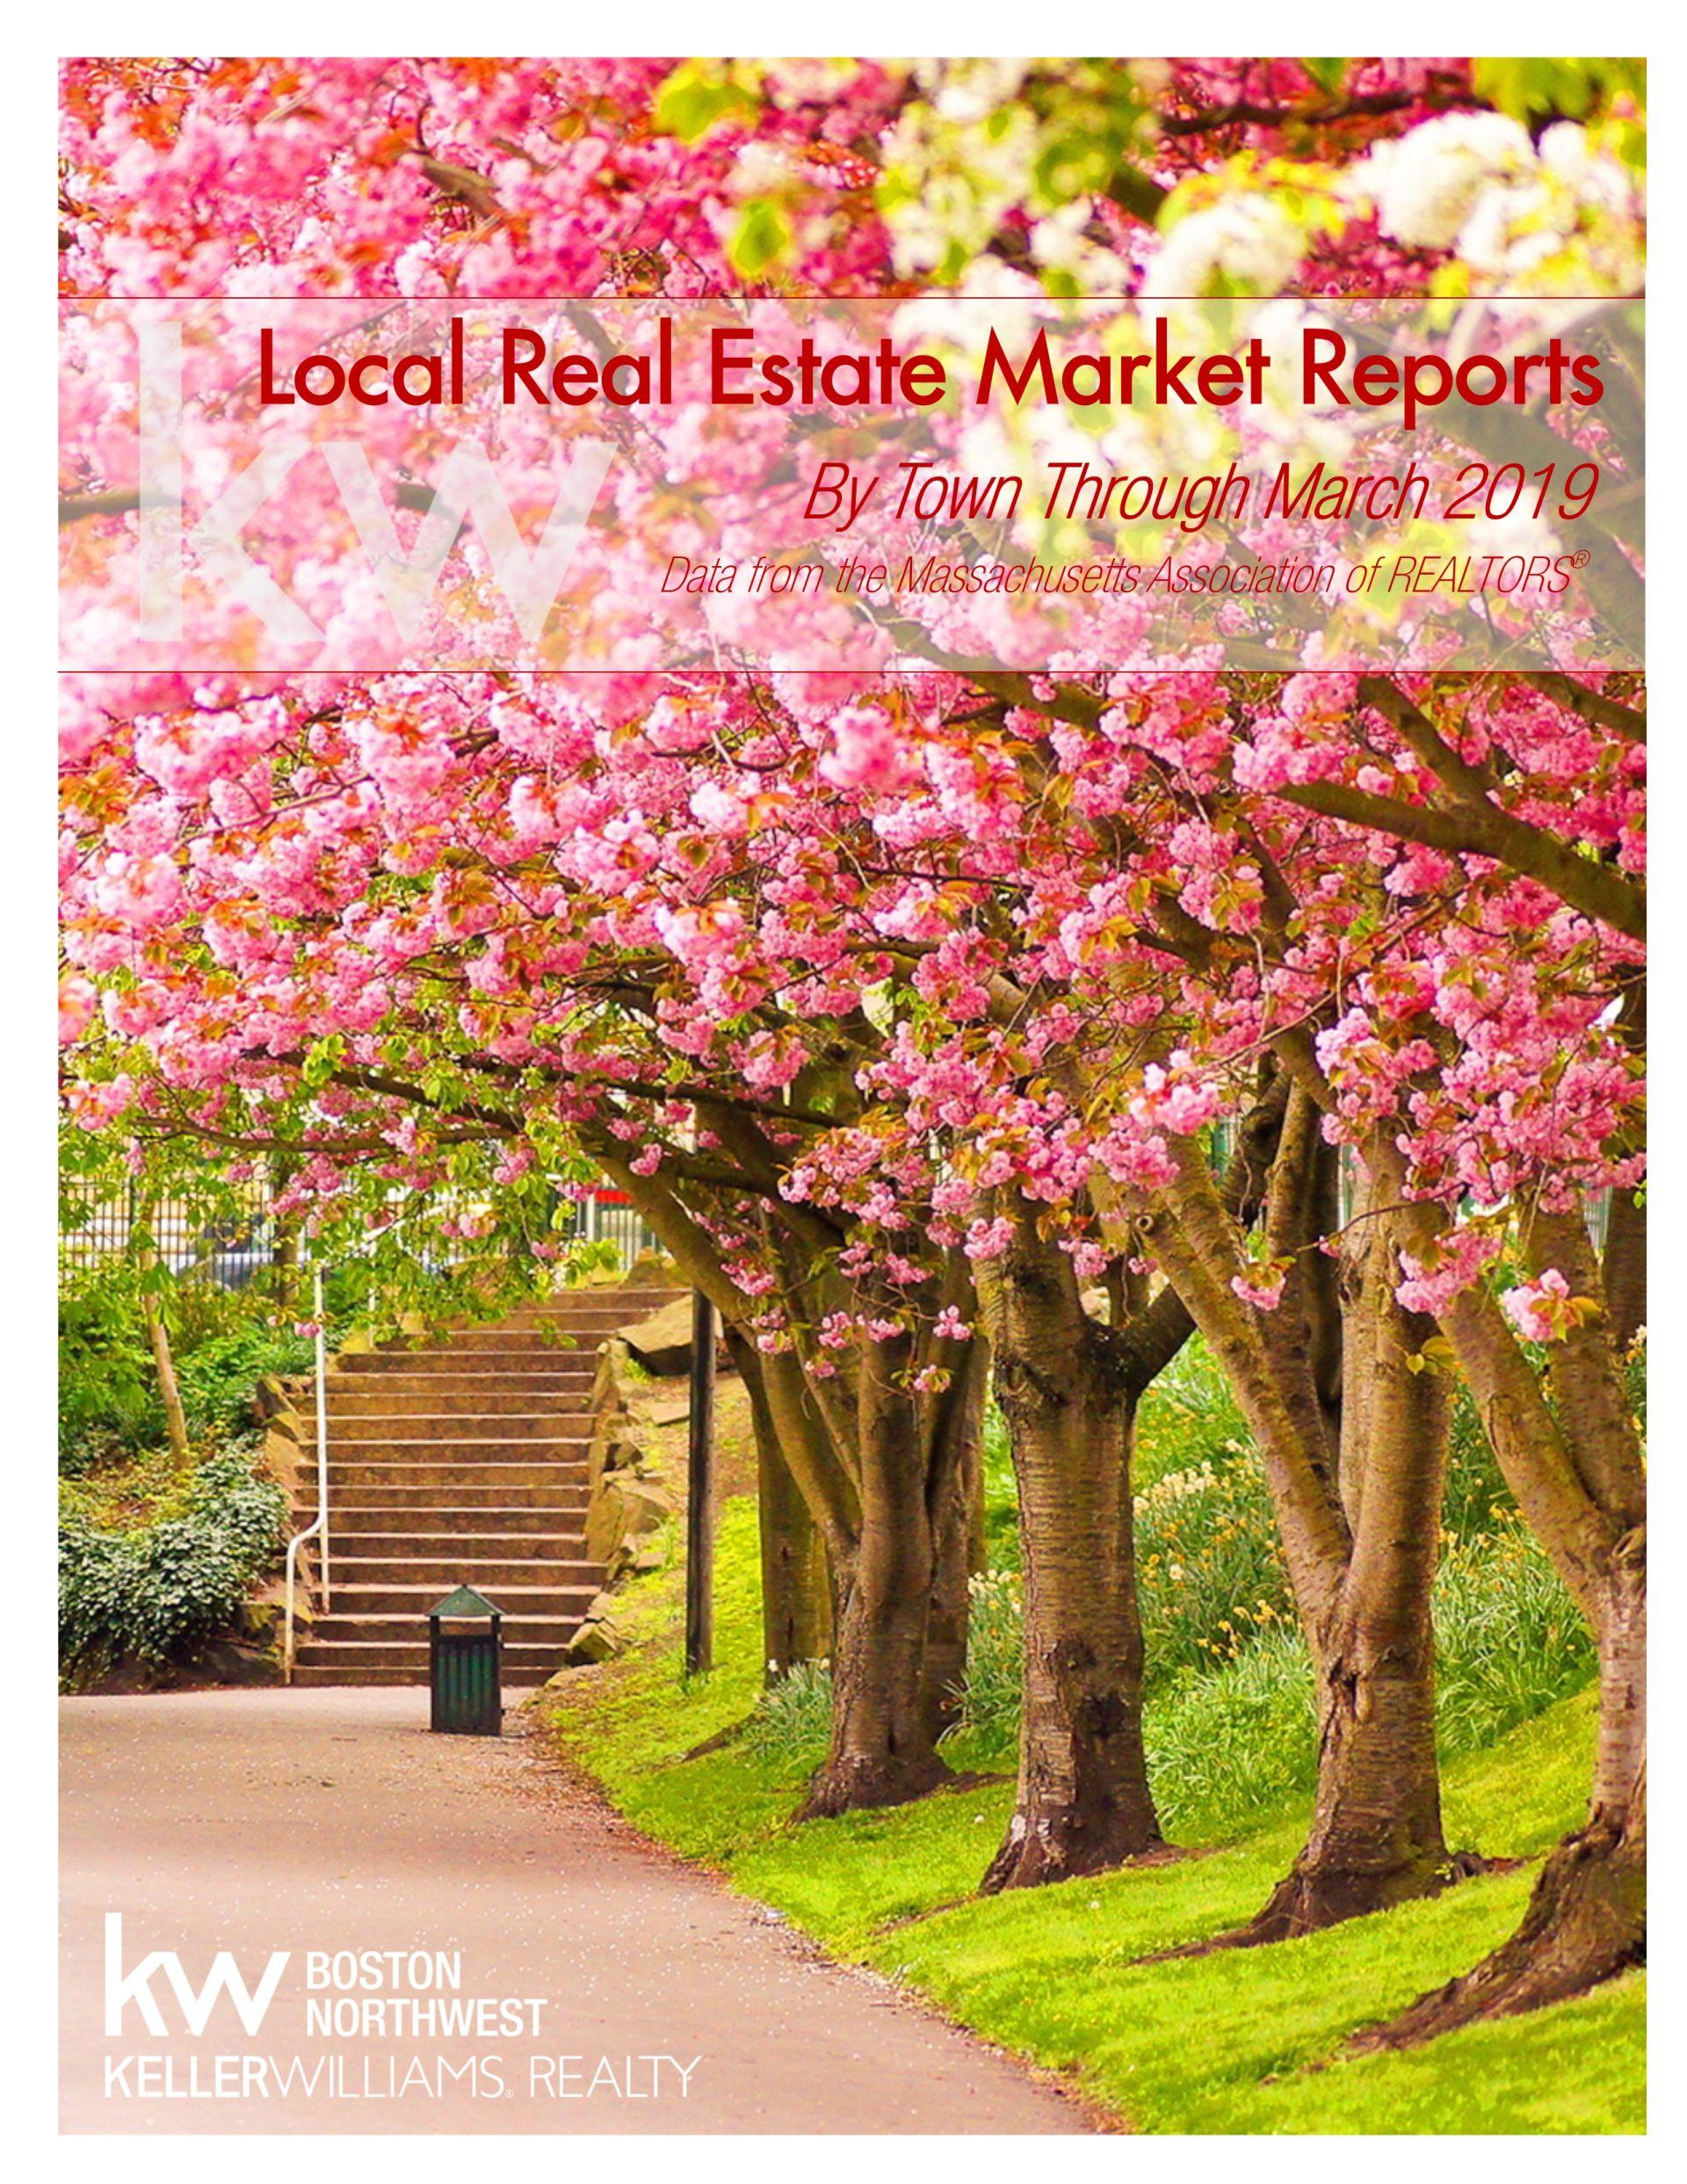 Market Report Through March 2019